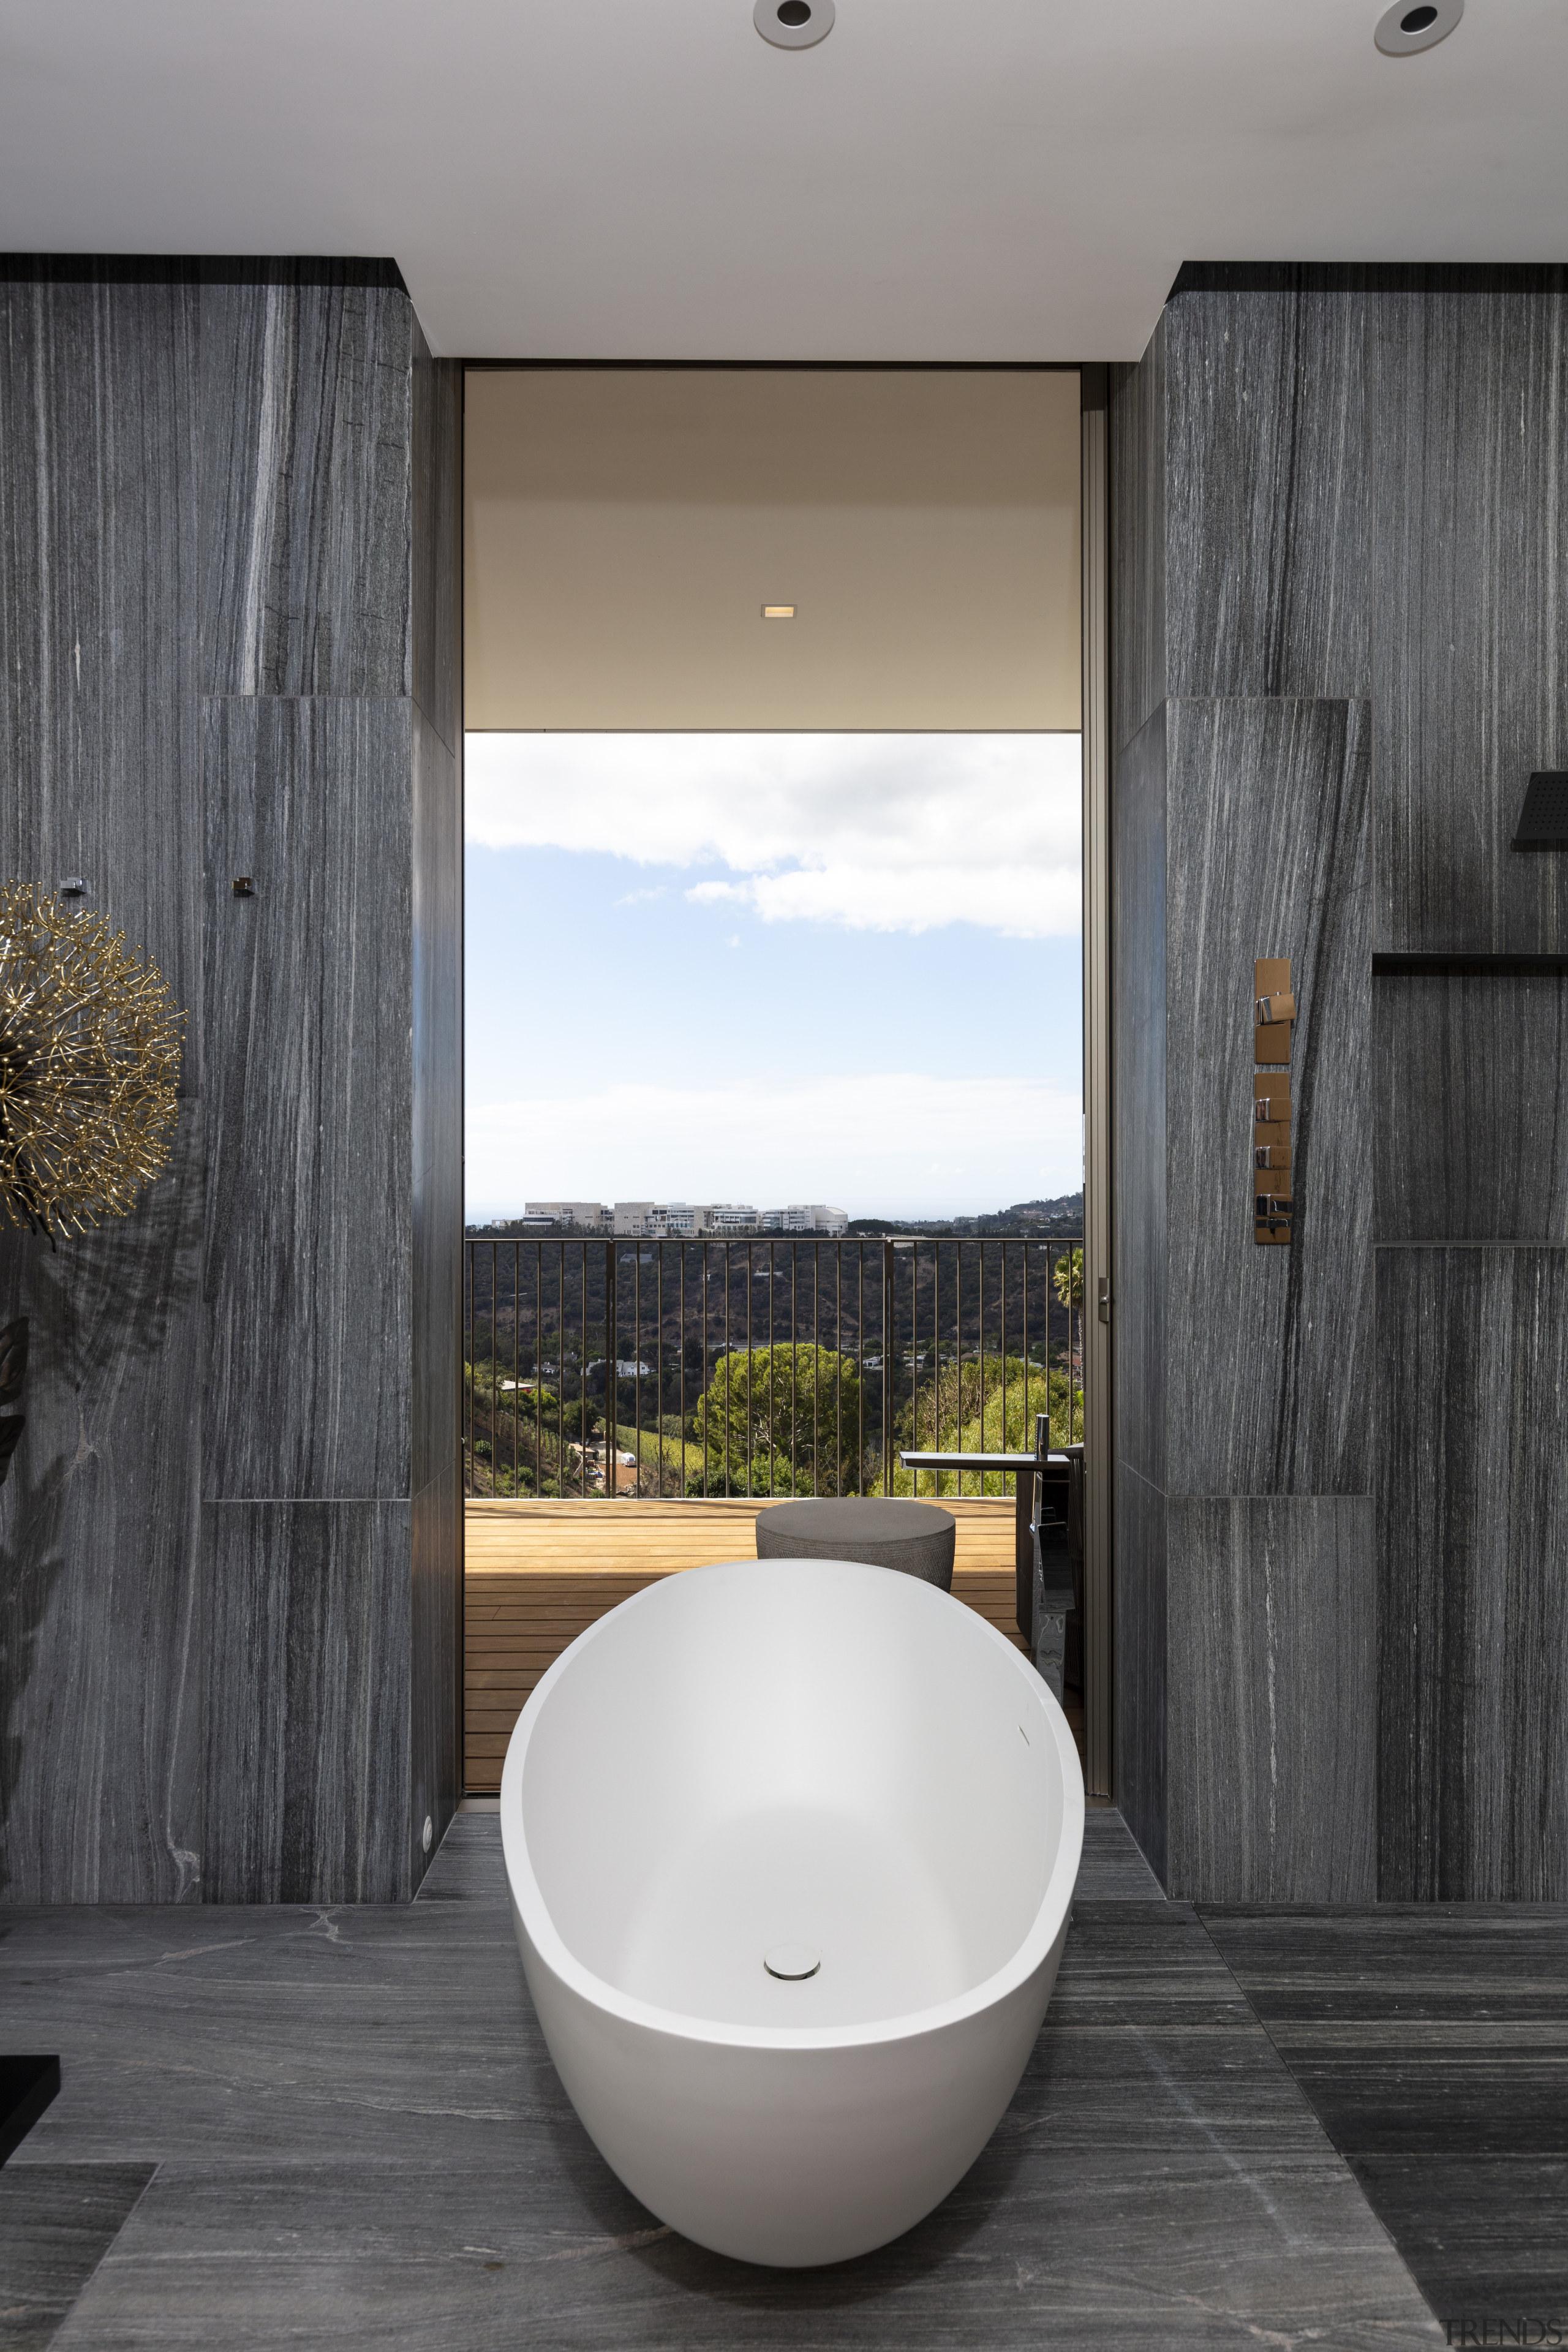 The ensuite for the guest 'mini master' in architecture, bathroom, ensuite, bathtub, home, house, interior design, plumbing fixture, SPFa